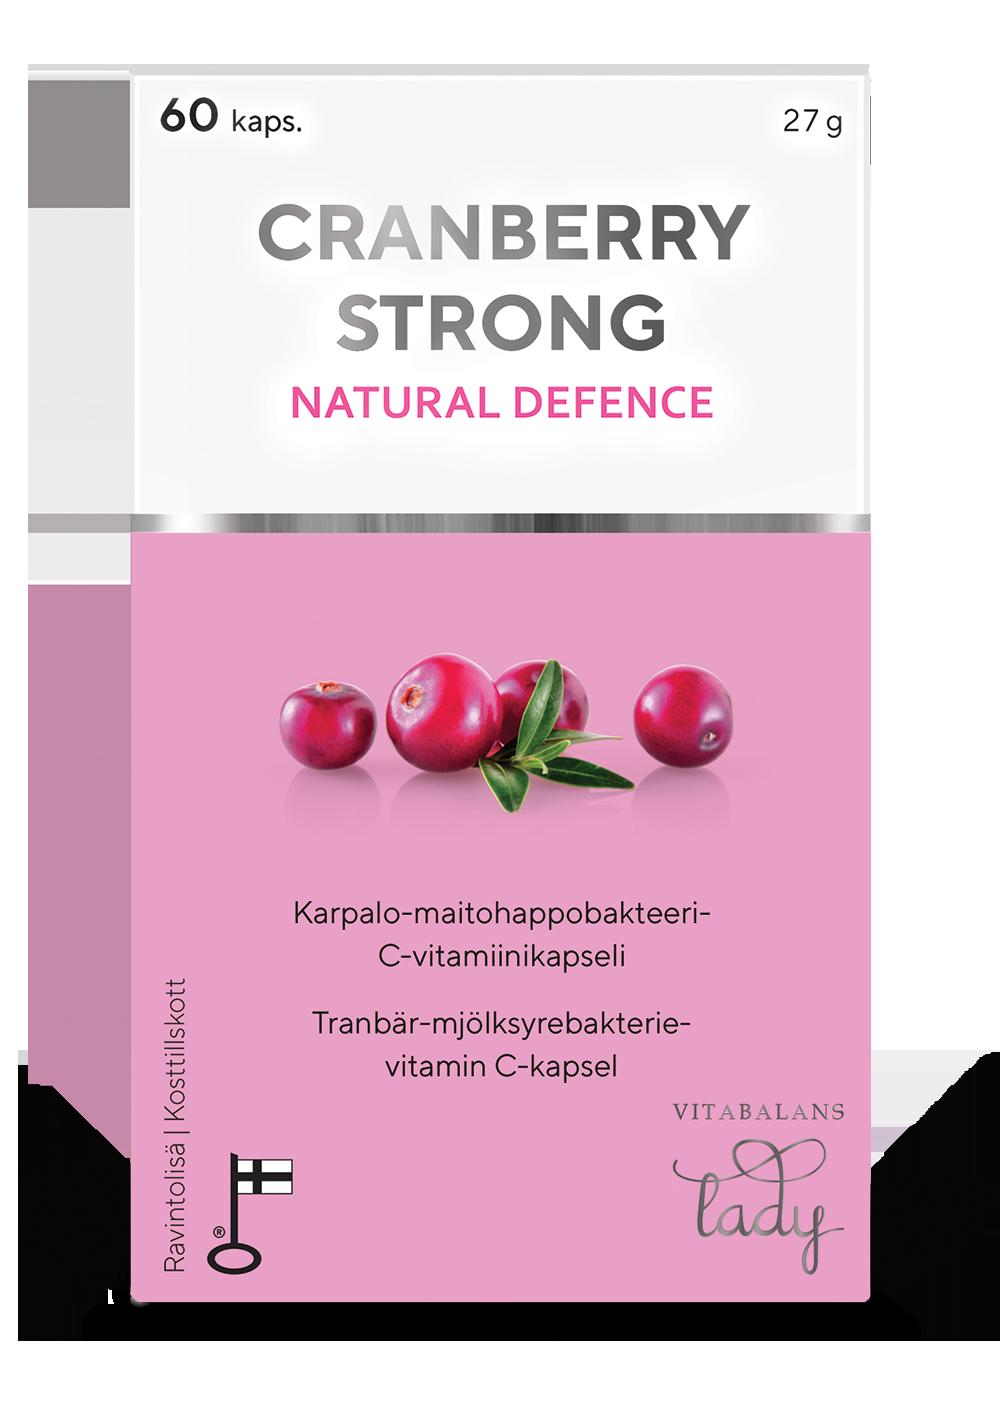 Cranberry Strong_brandsite_2020-03